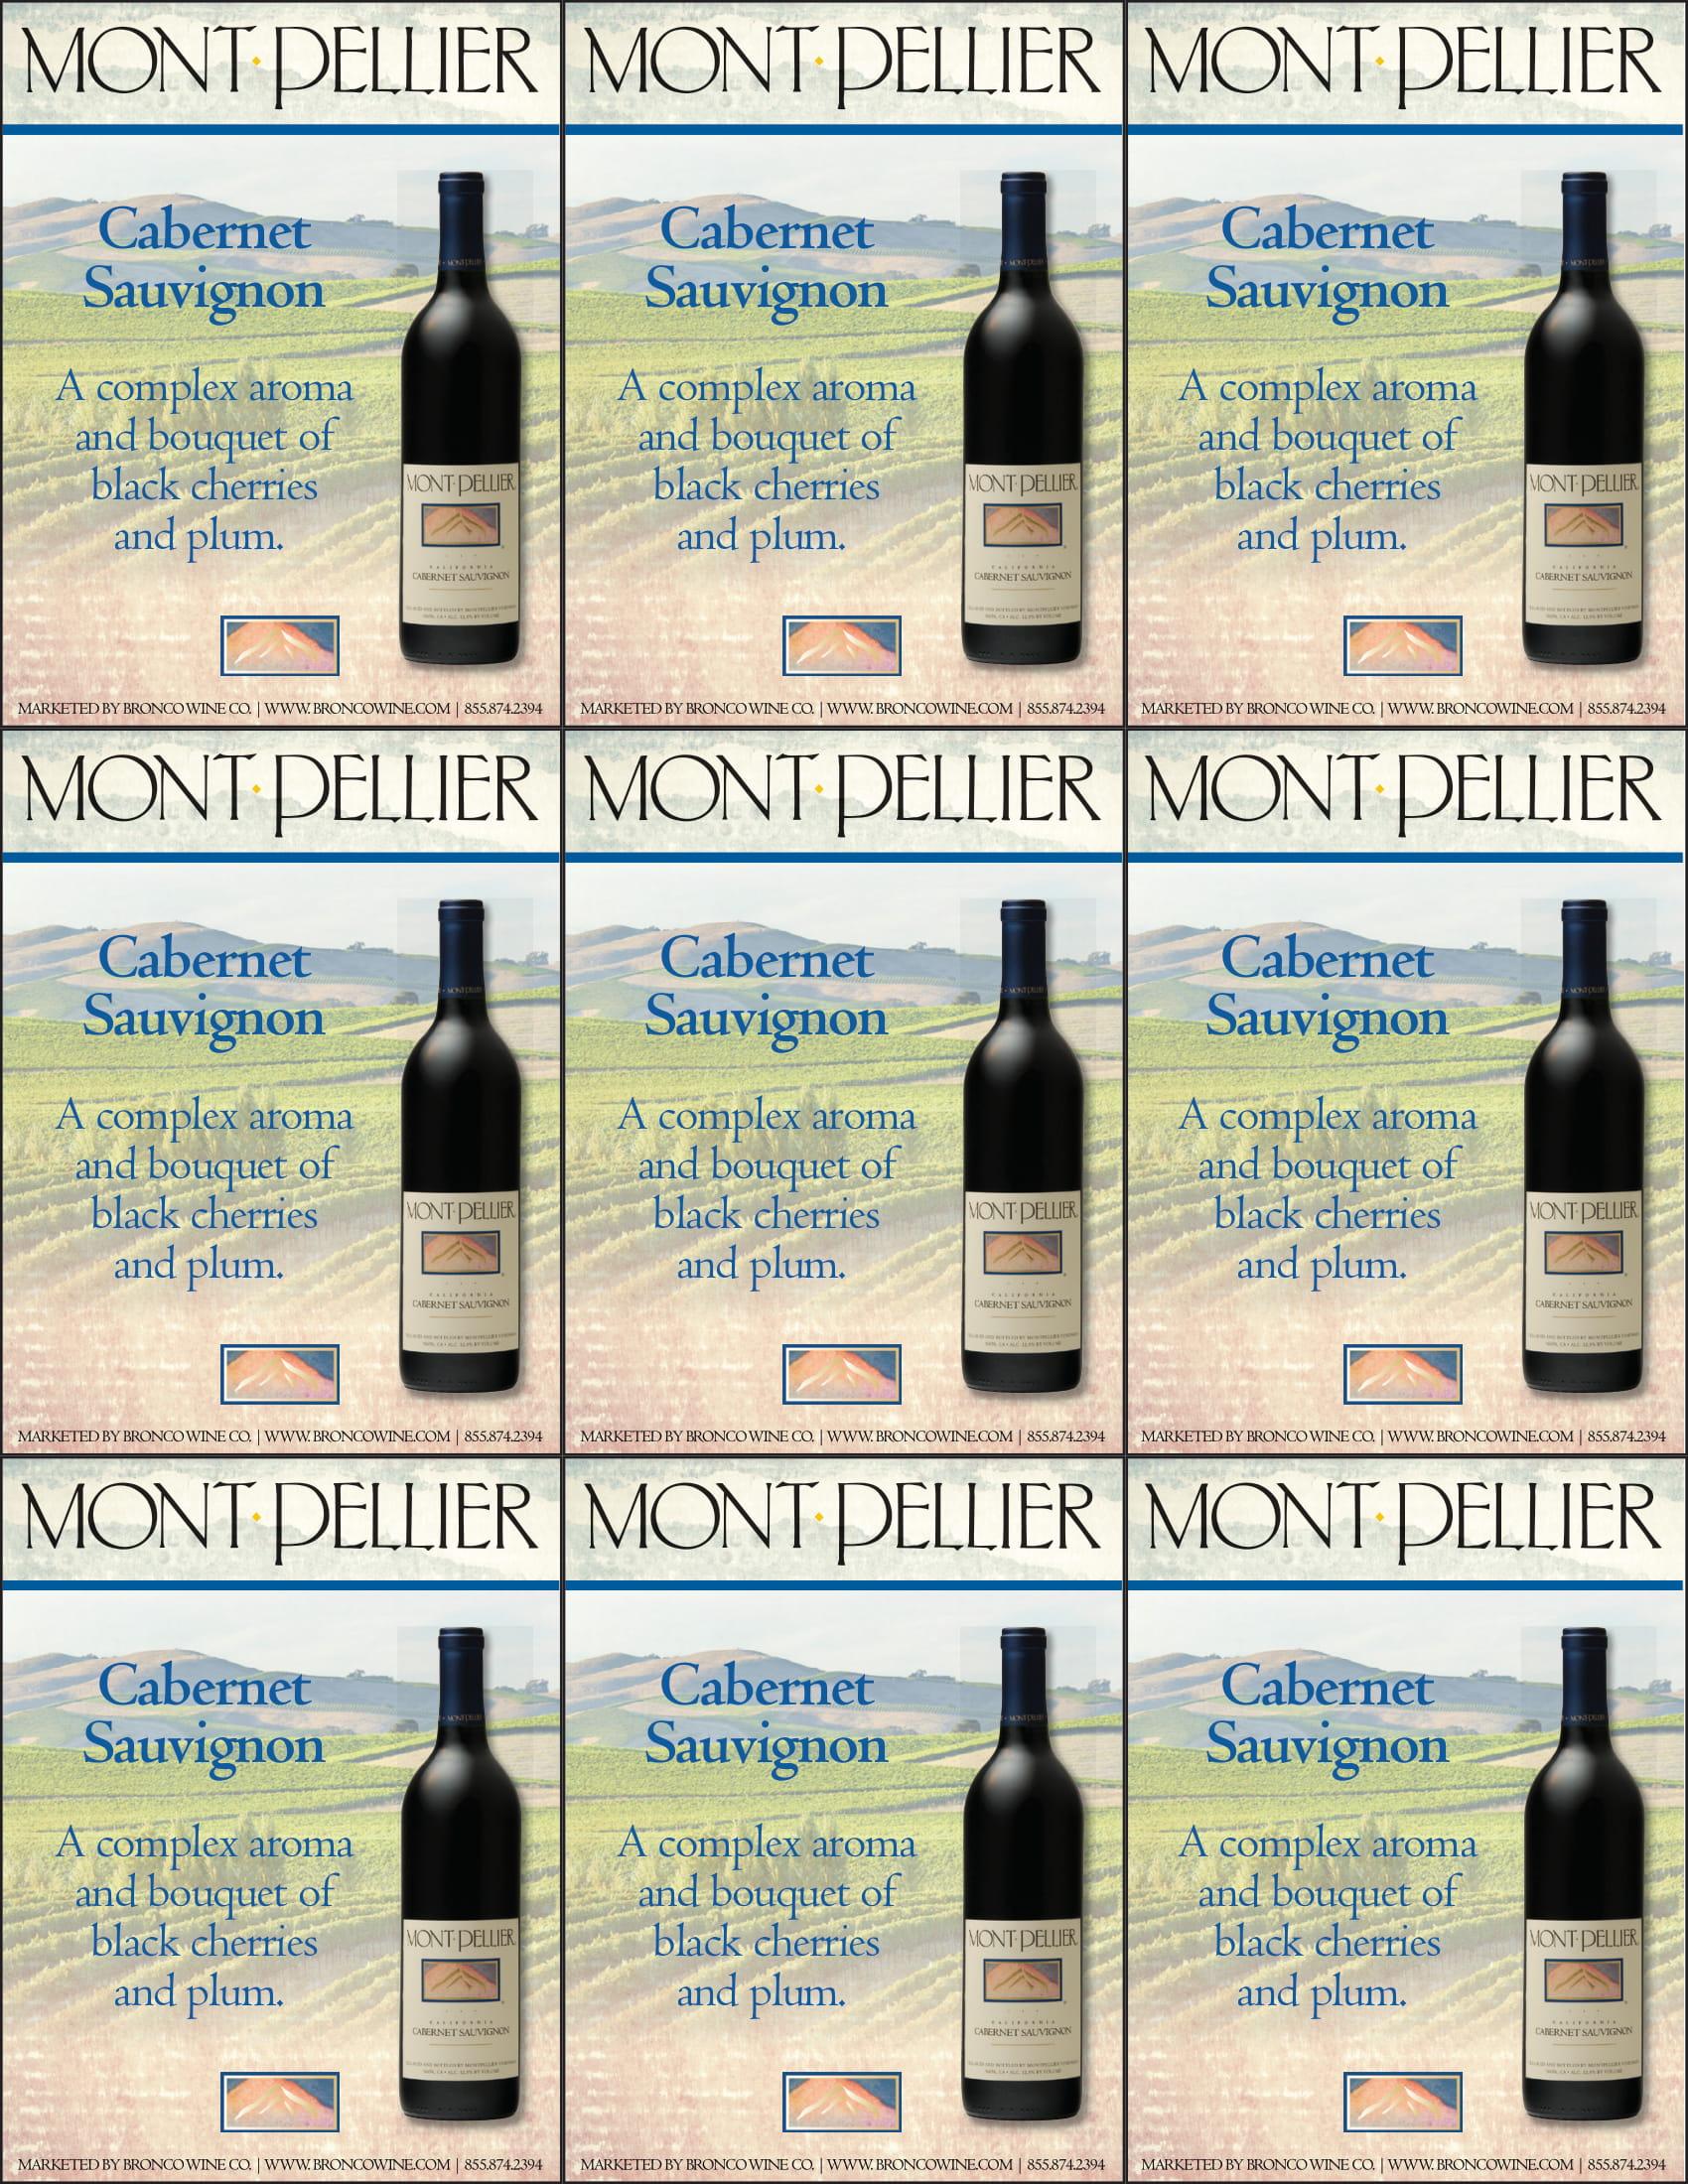 Montpellier Cabernet Sauvignon Shelf Talker